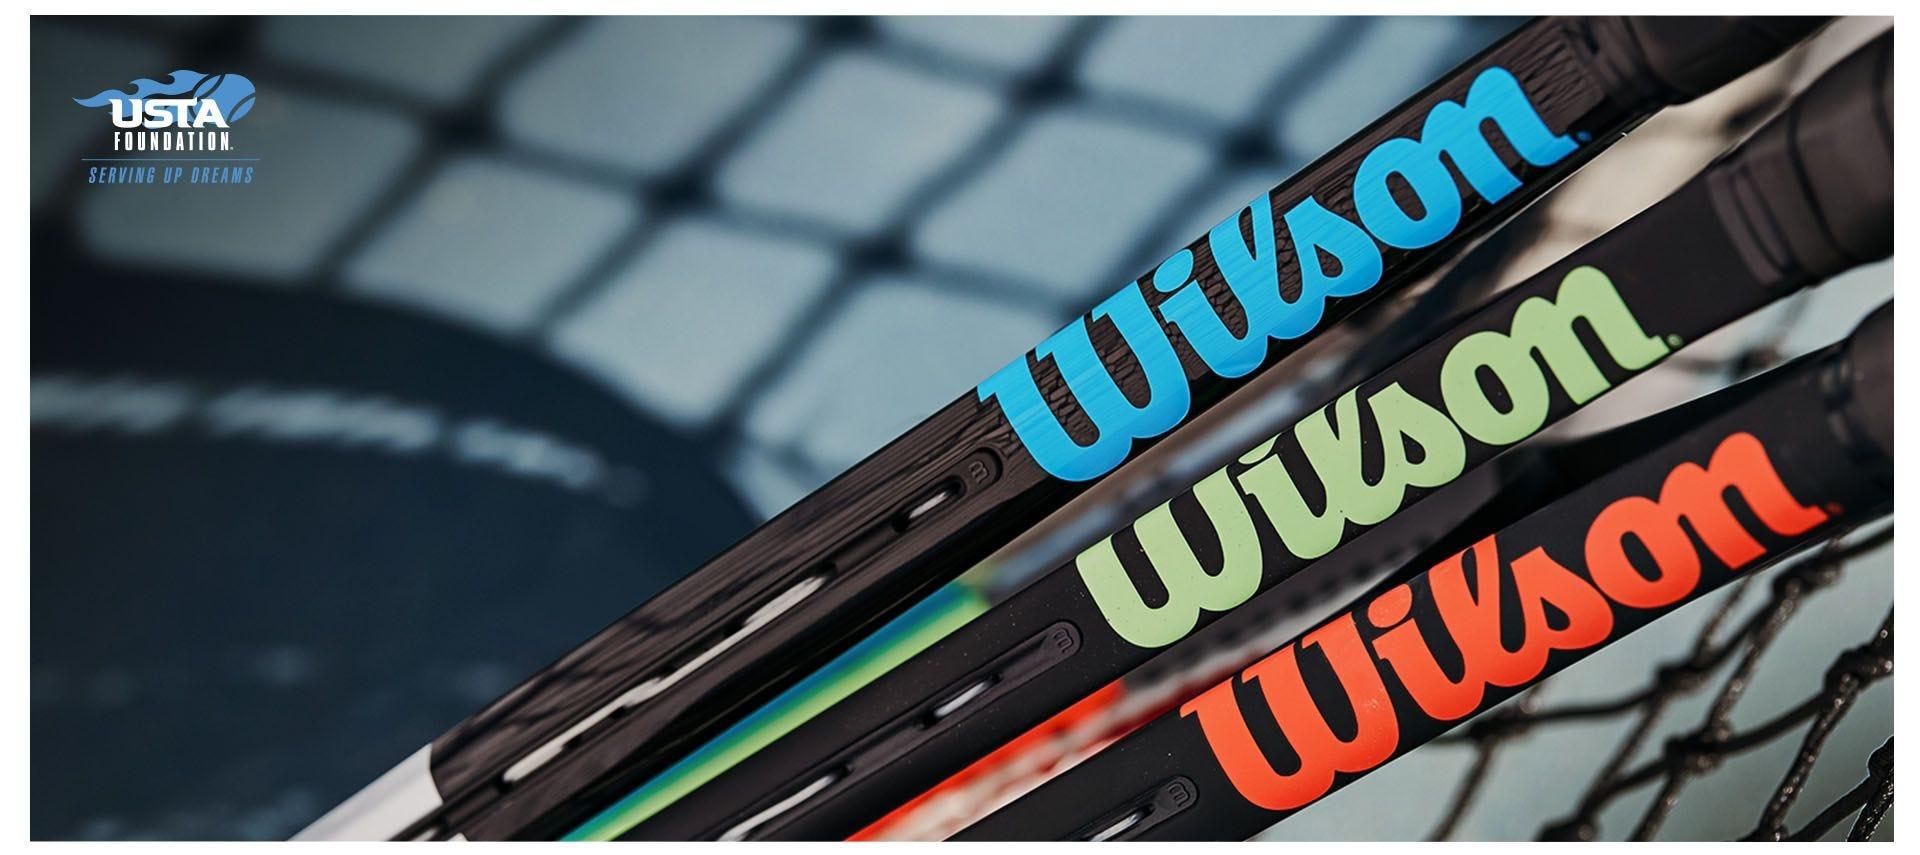 Lineup of WIlson rackets against a net